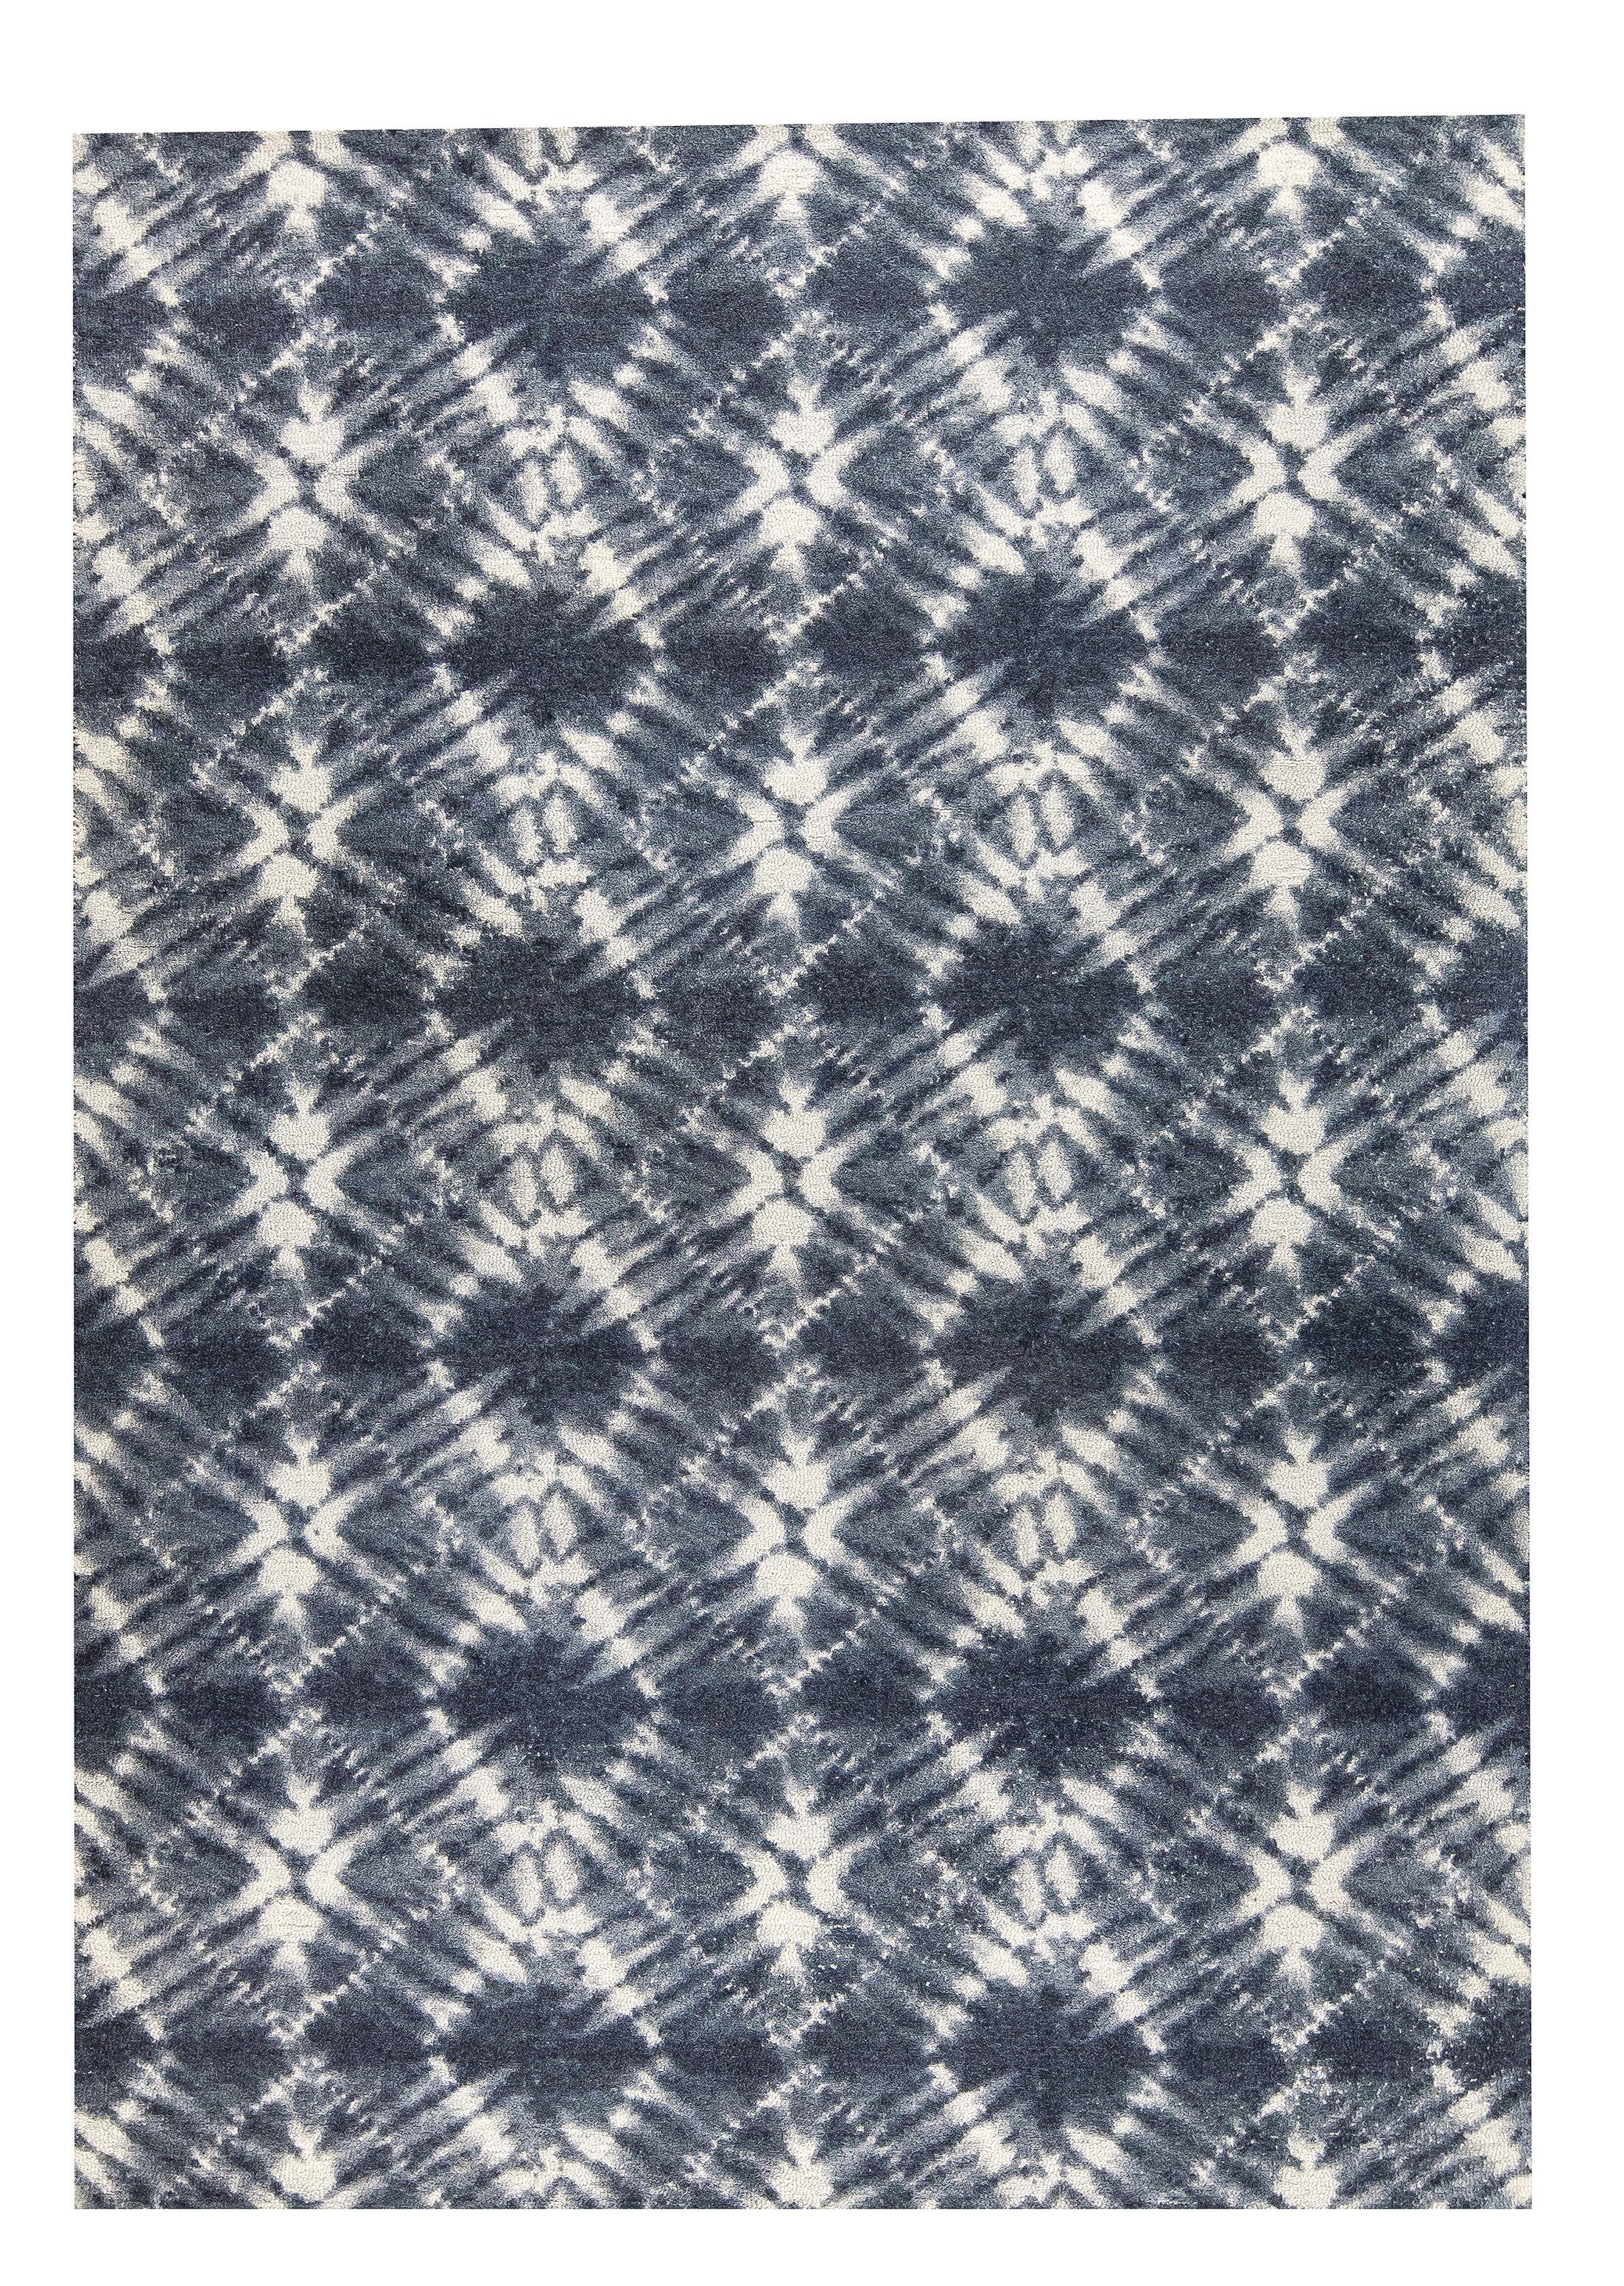 Lakeland Hand-Woven Gray Area Rug Rug Size: 8' x 10'